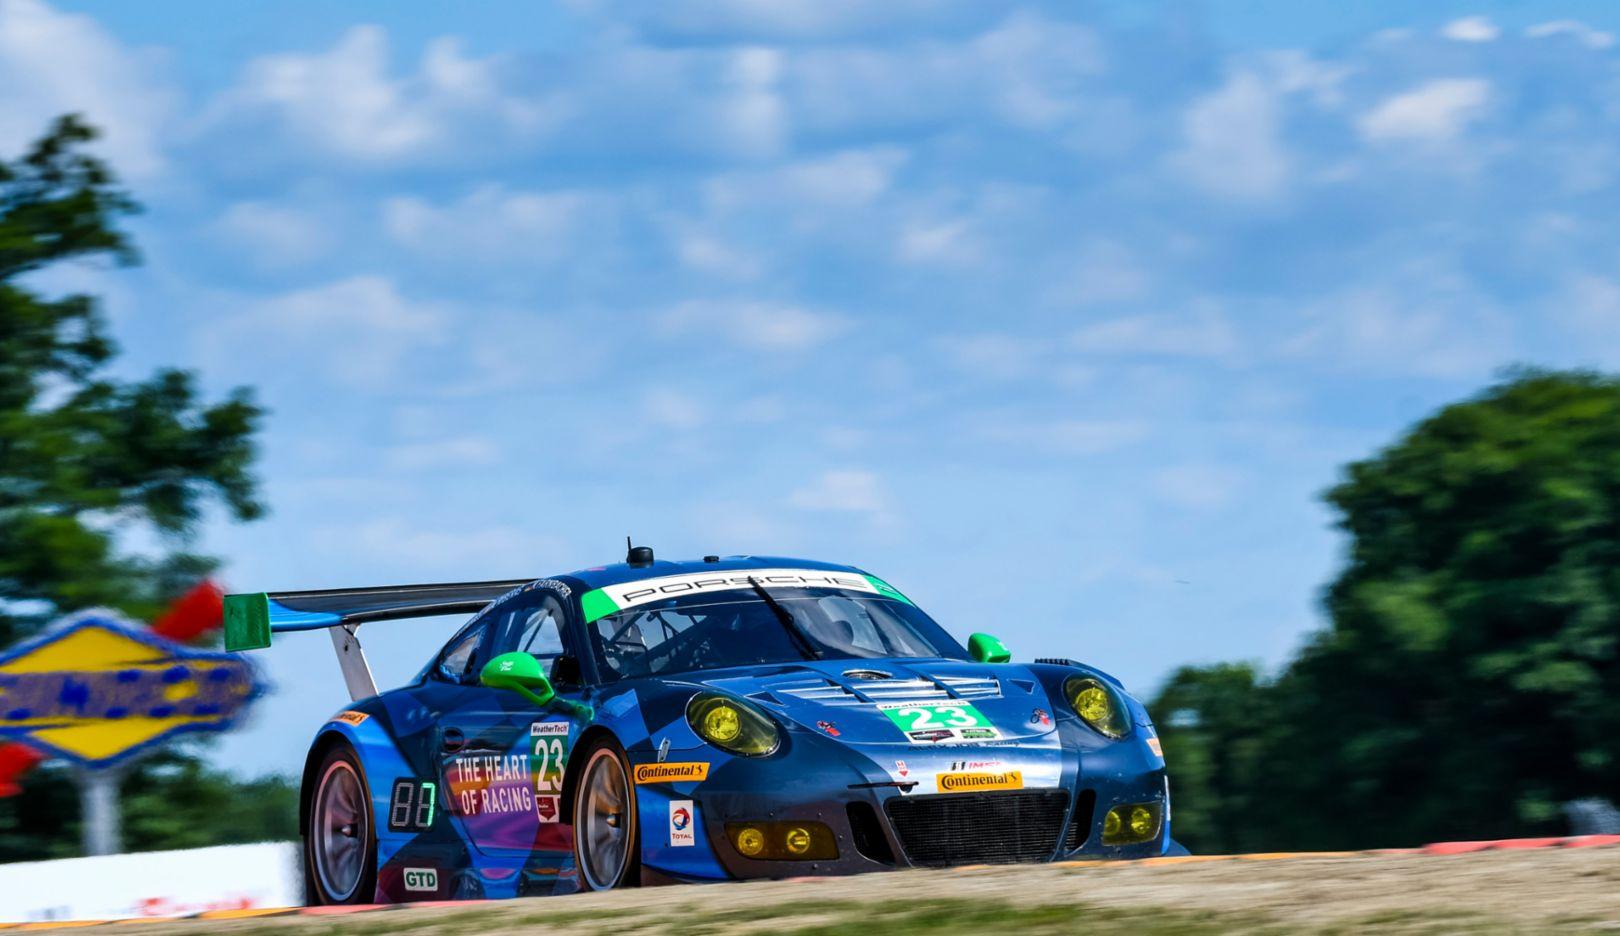 Porsche 911 GT3 R, Watkins Glen, IMSA WeatherTech SportsCar Championship, 2016, Porsche AG